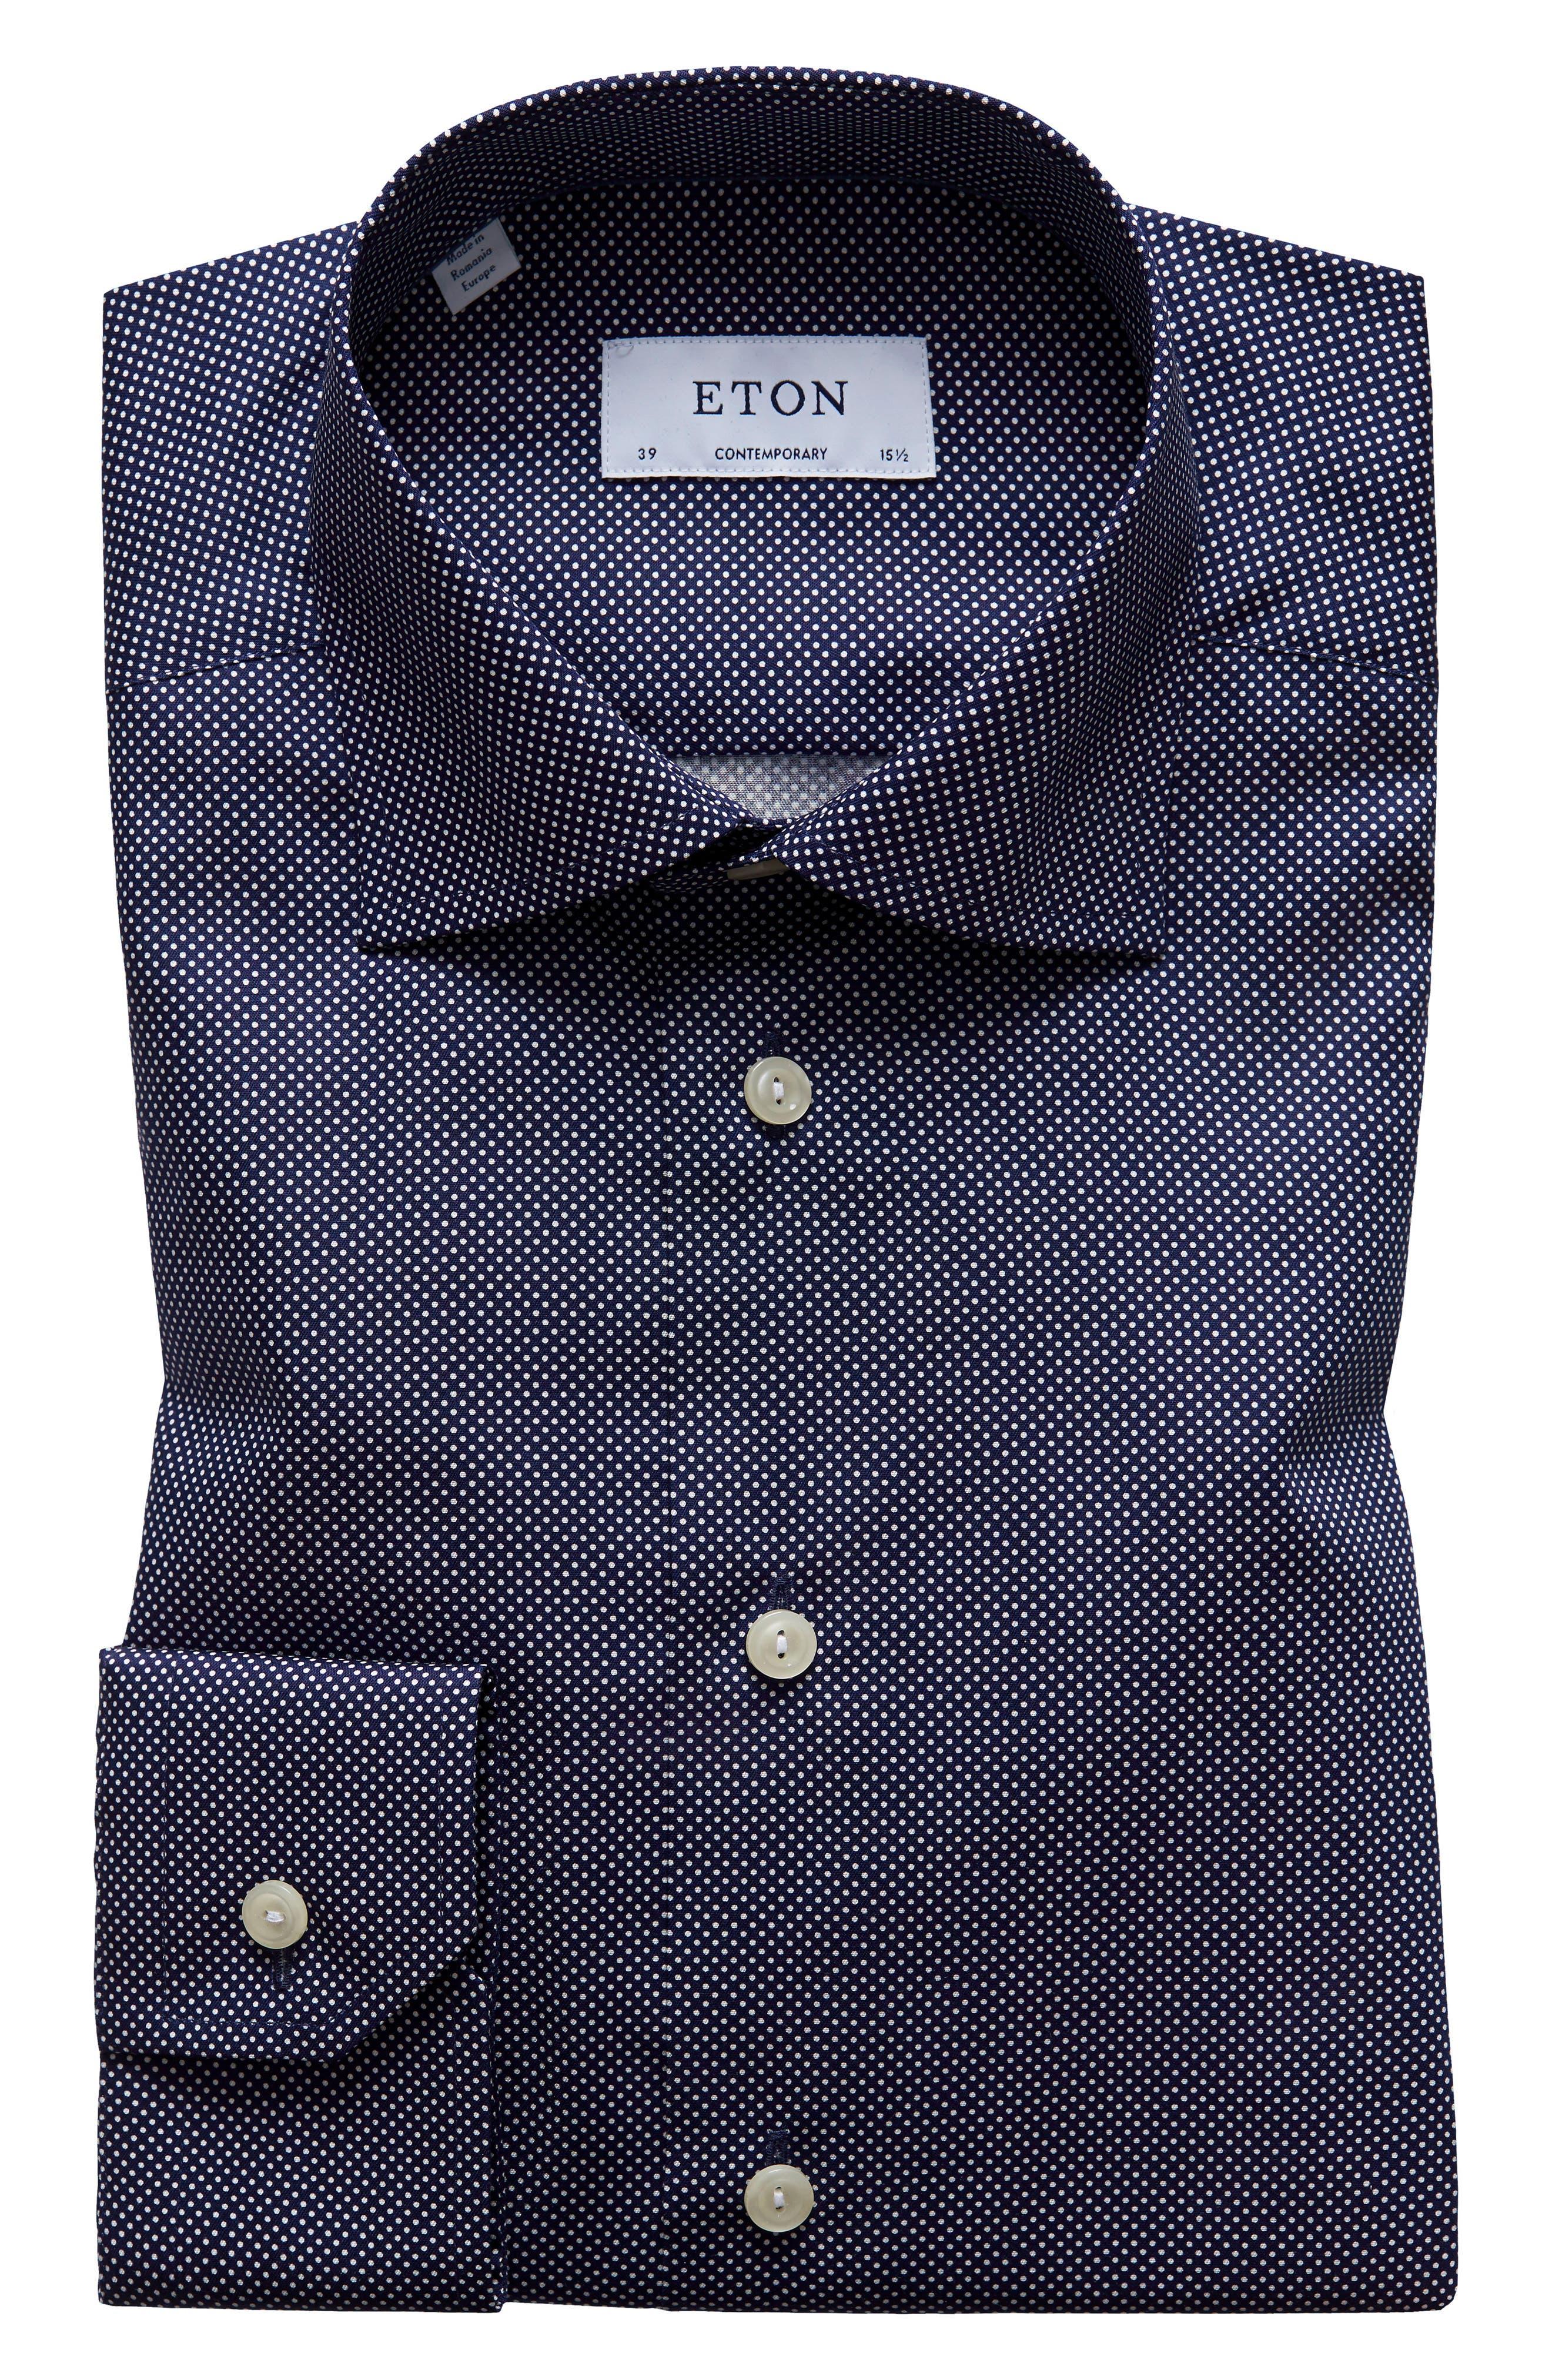 Main Image - Eton Contemporary Fit Signature Polka Dot Dress Shirt